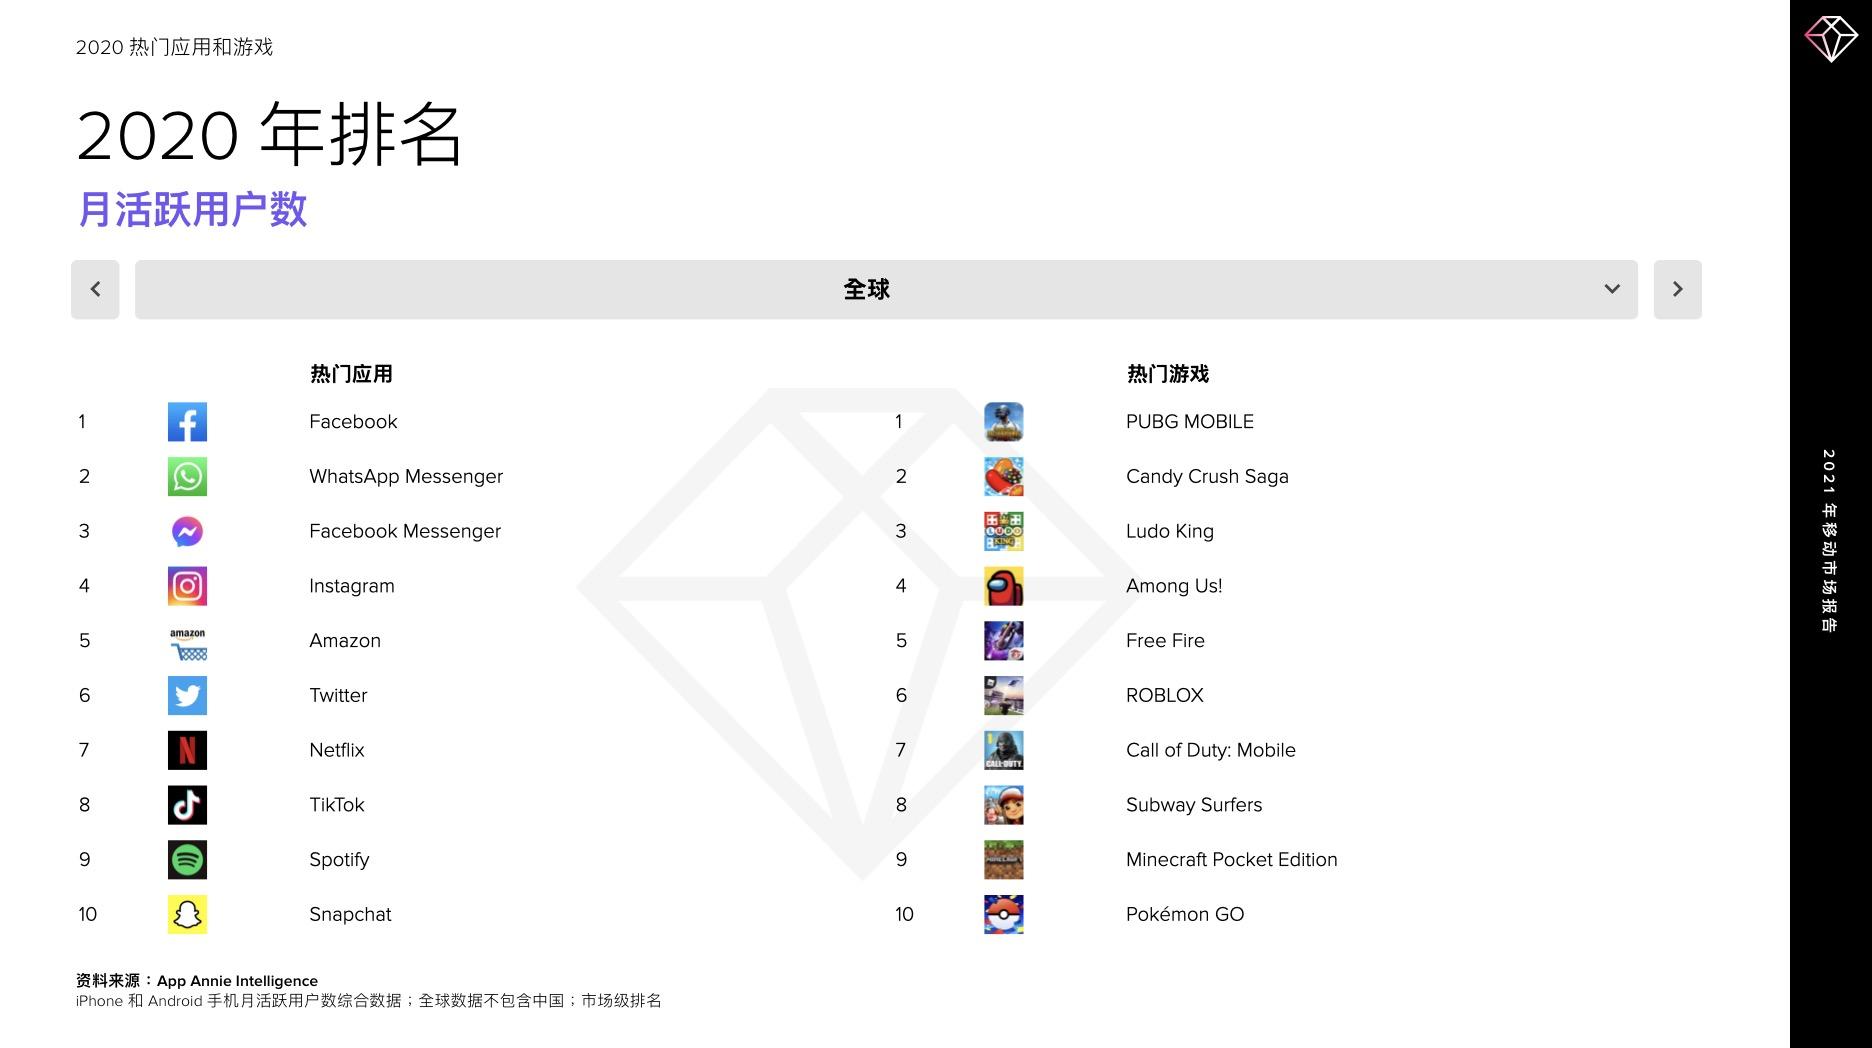 CleanShot 2021-01-13 at 09.37.52@2x.jpg